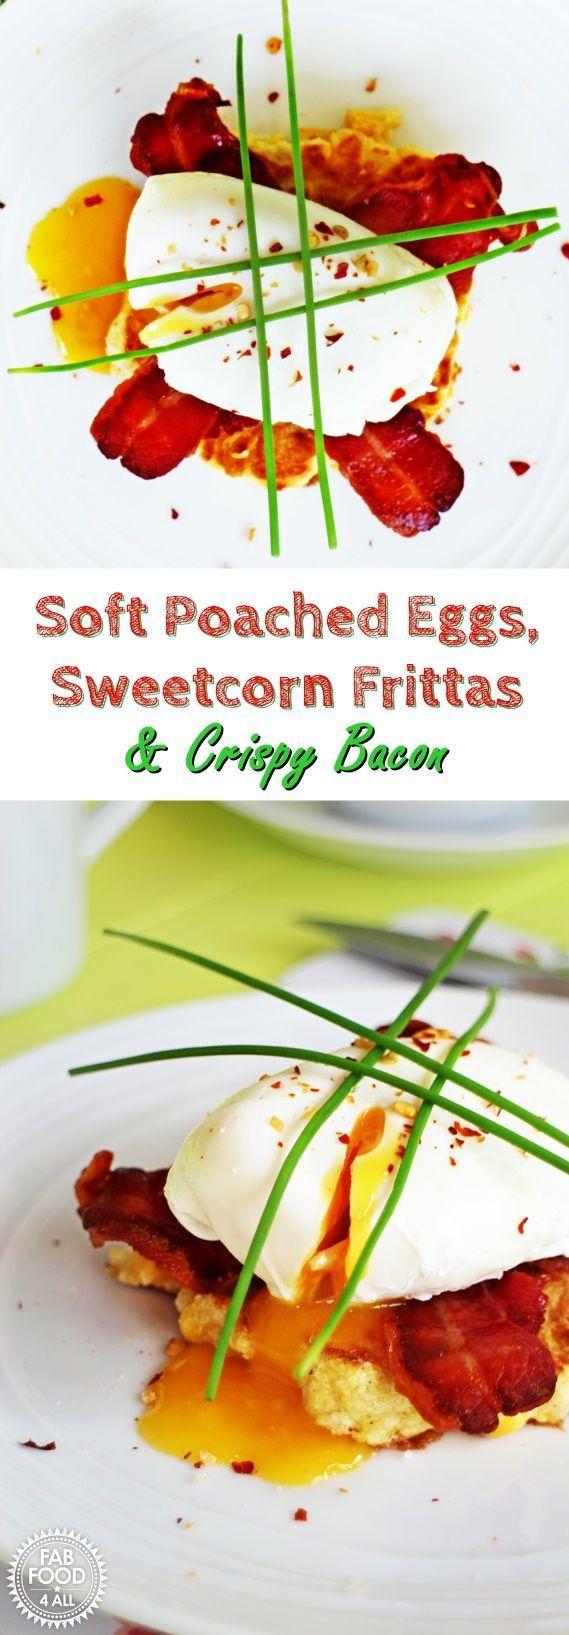 Soft Poached Eggs, Sweetcorn Frittas and Crispy Bacon - Fab Food 4 All #sweetcornideas